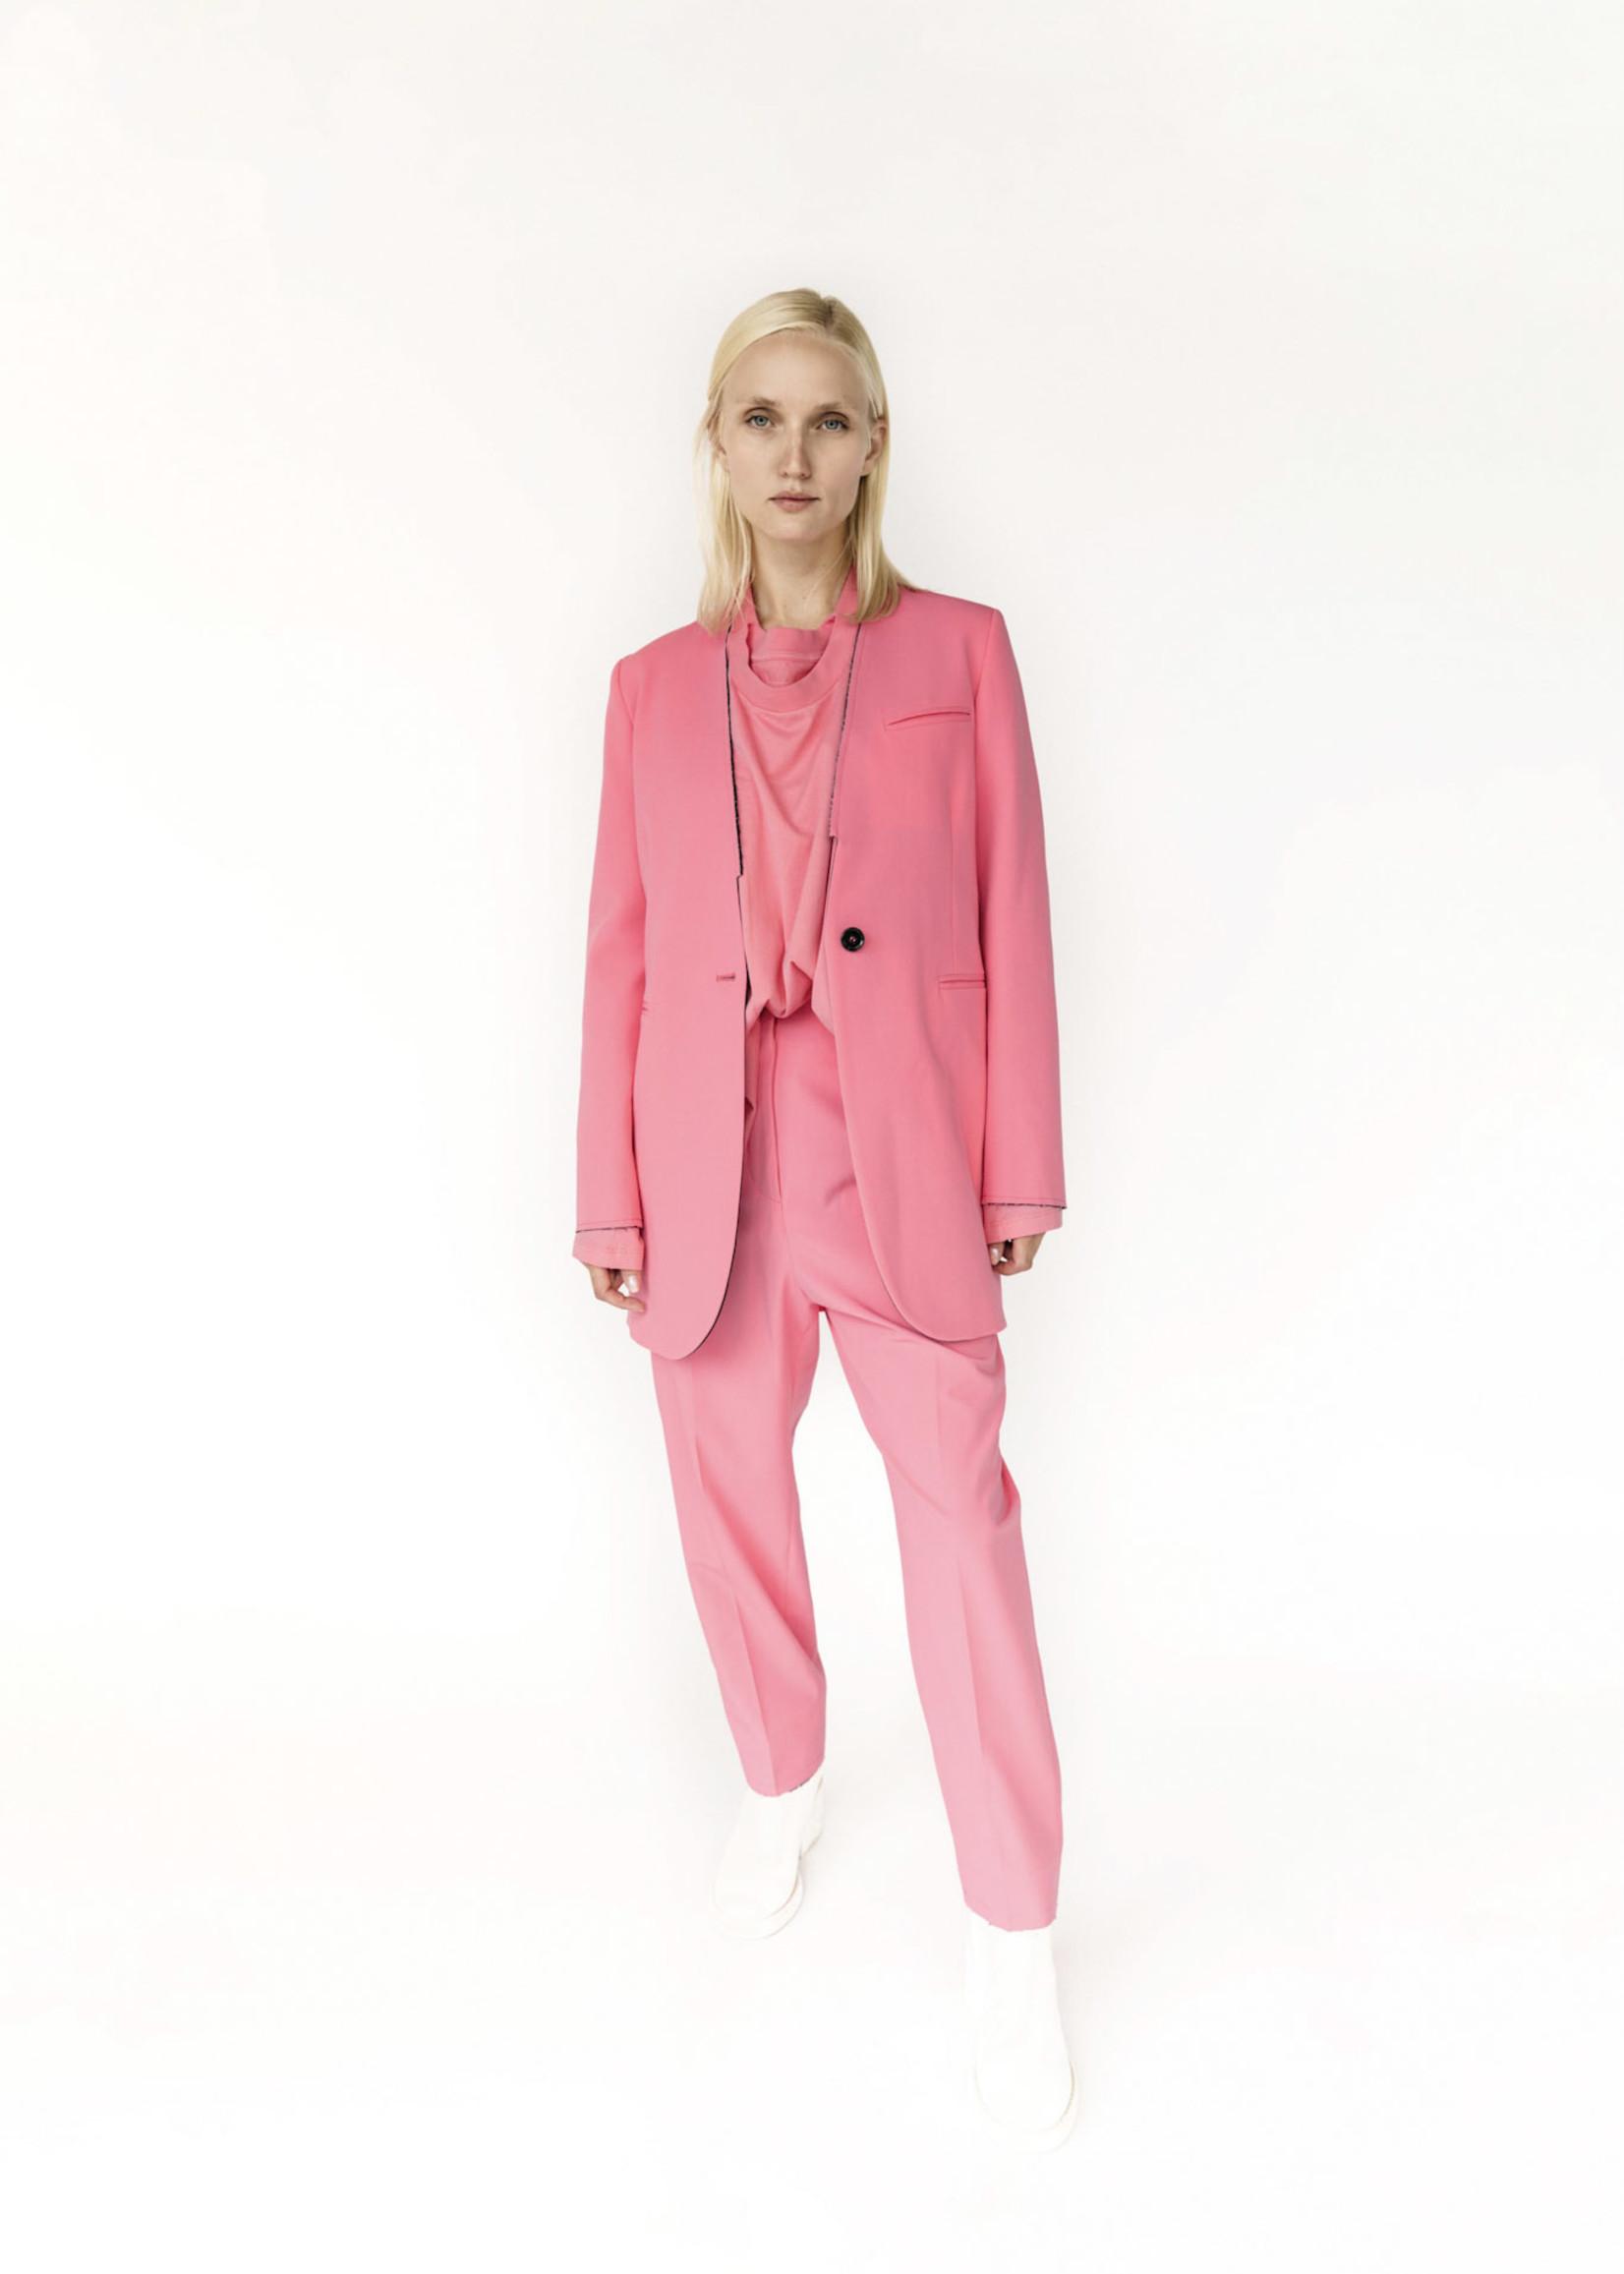 MM6 MAISON MARGIELA Neon Pink Raw Edge Trouser